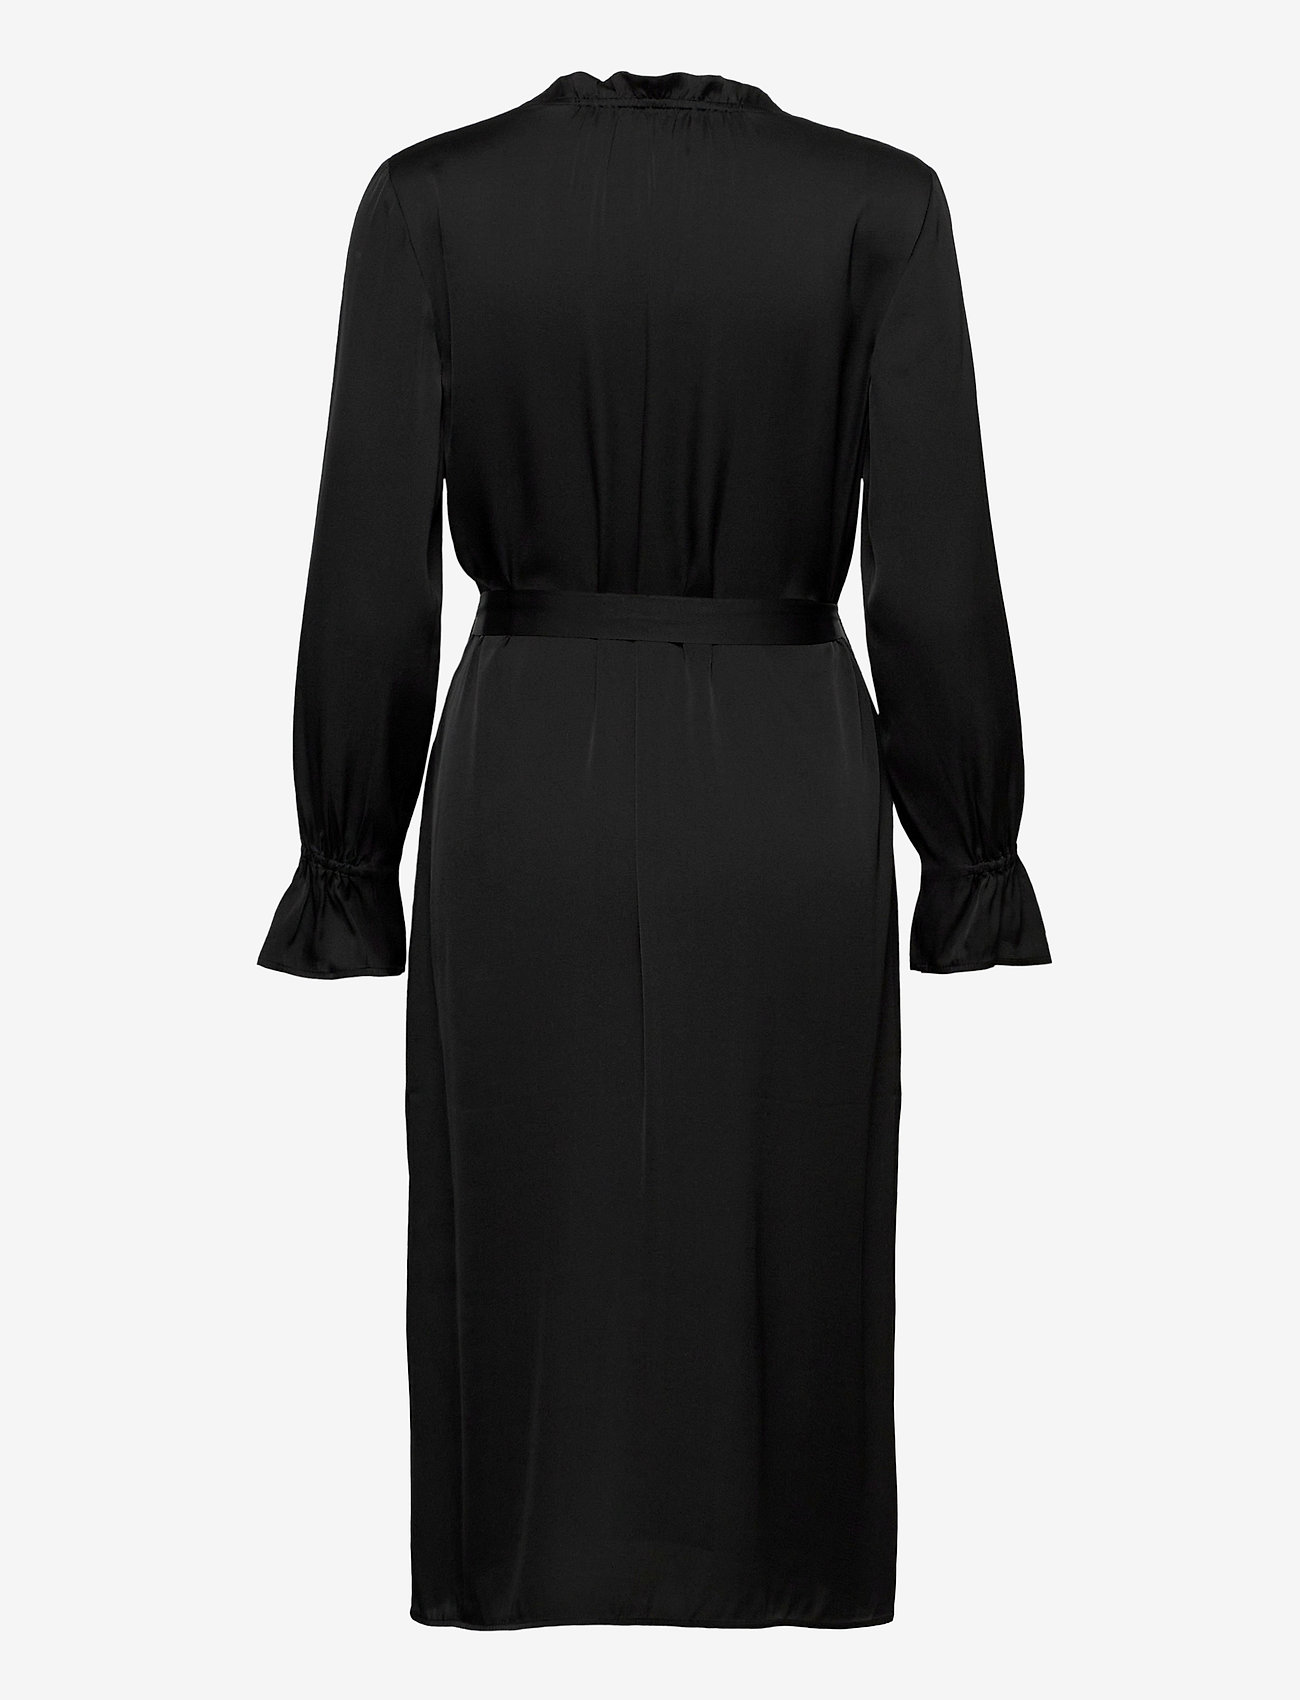 SAND - Satin Stretch - Raya FS Dress - robes midi - black - 1